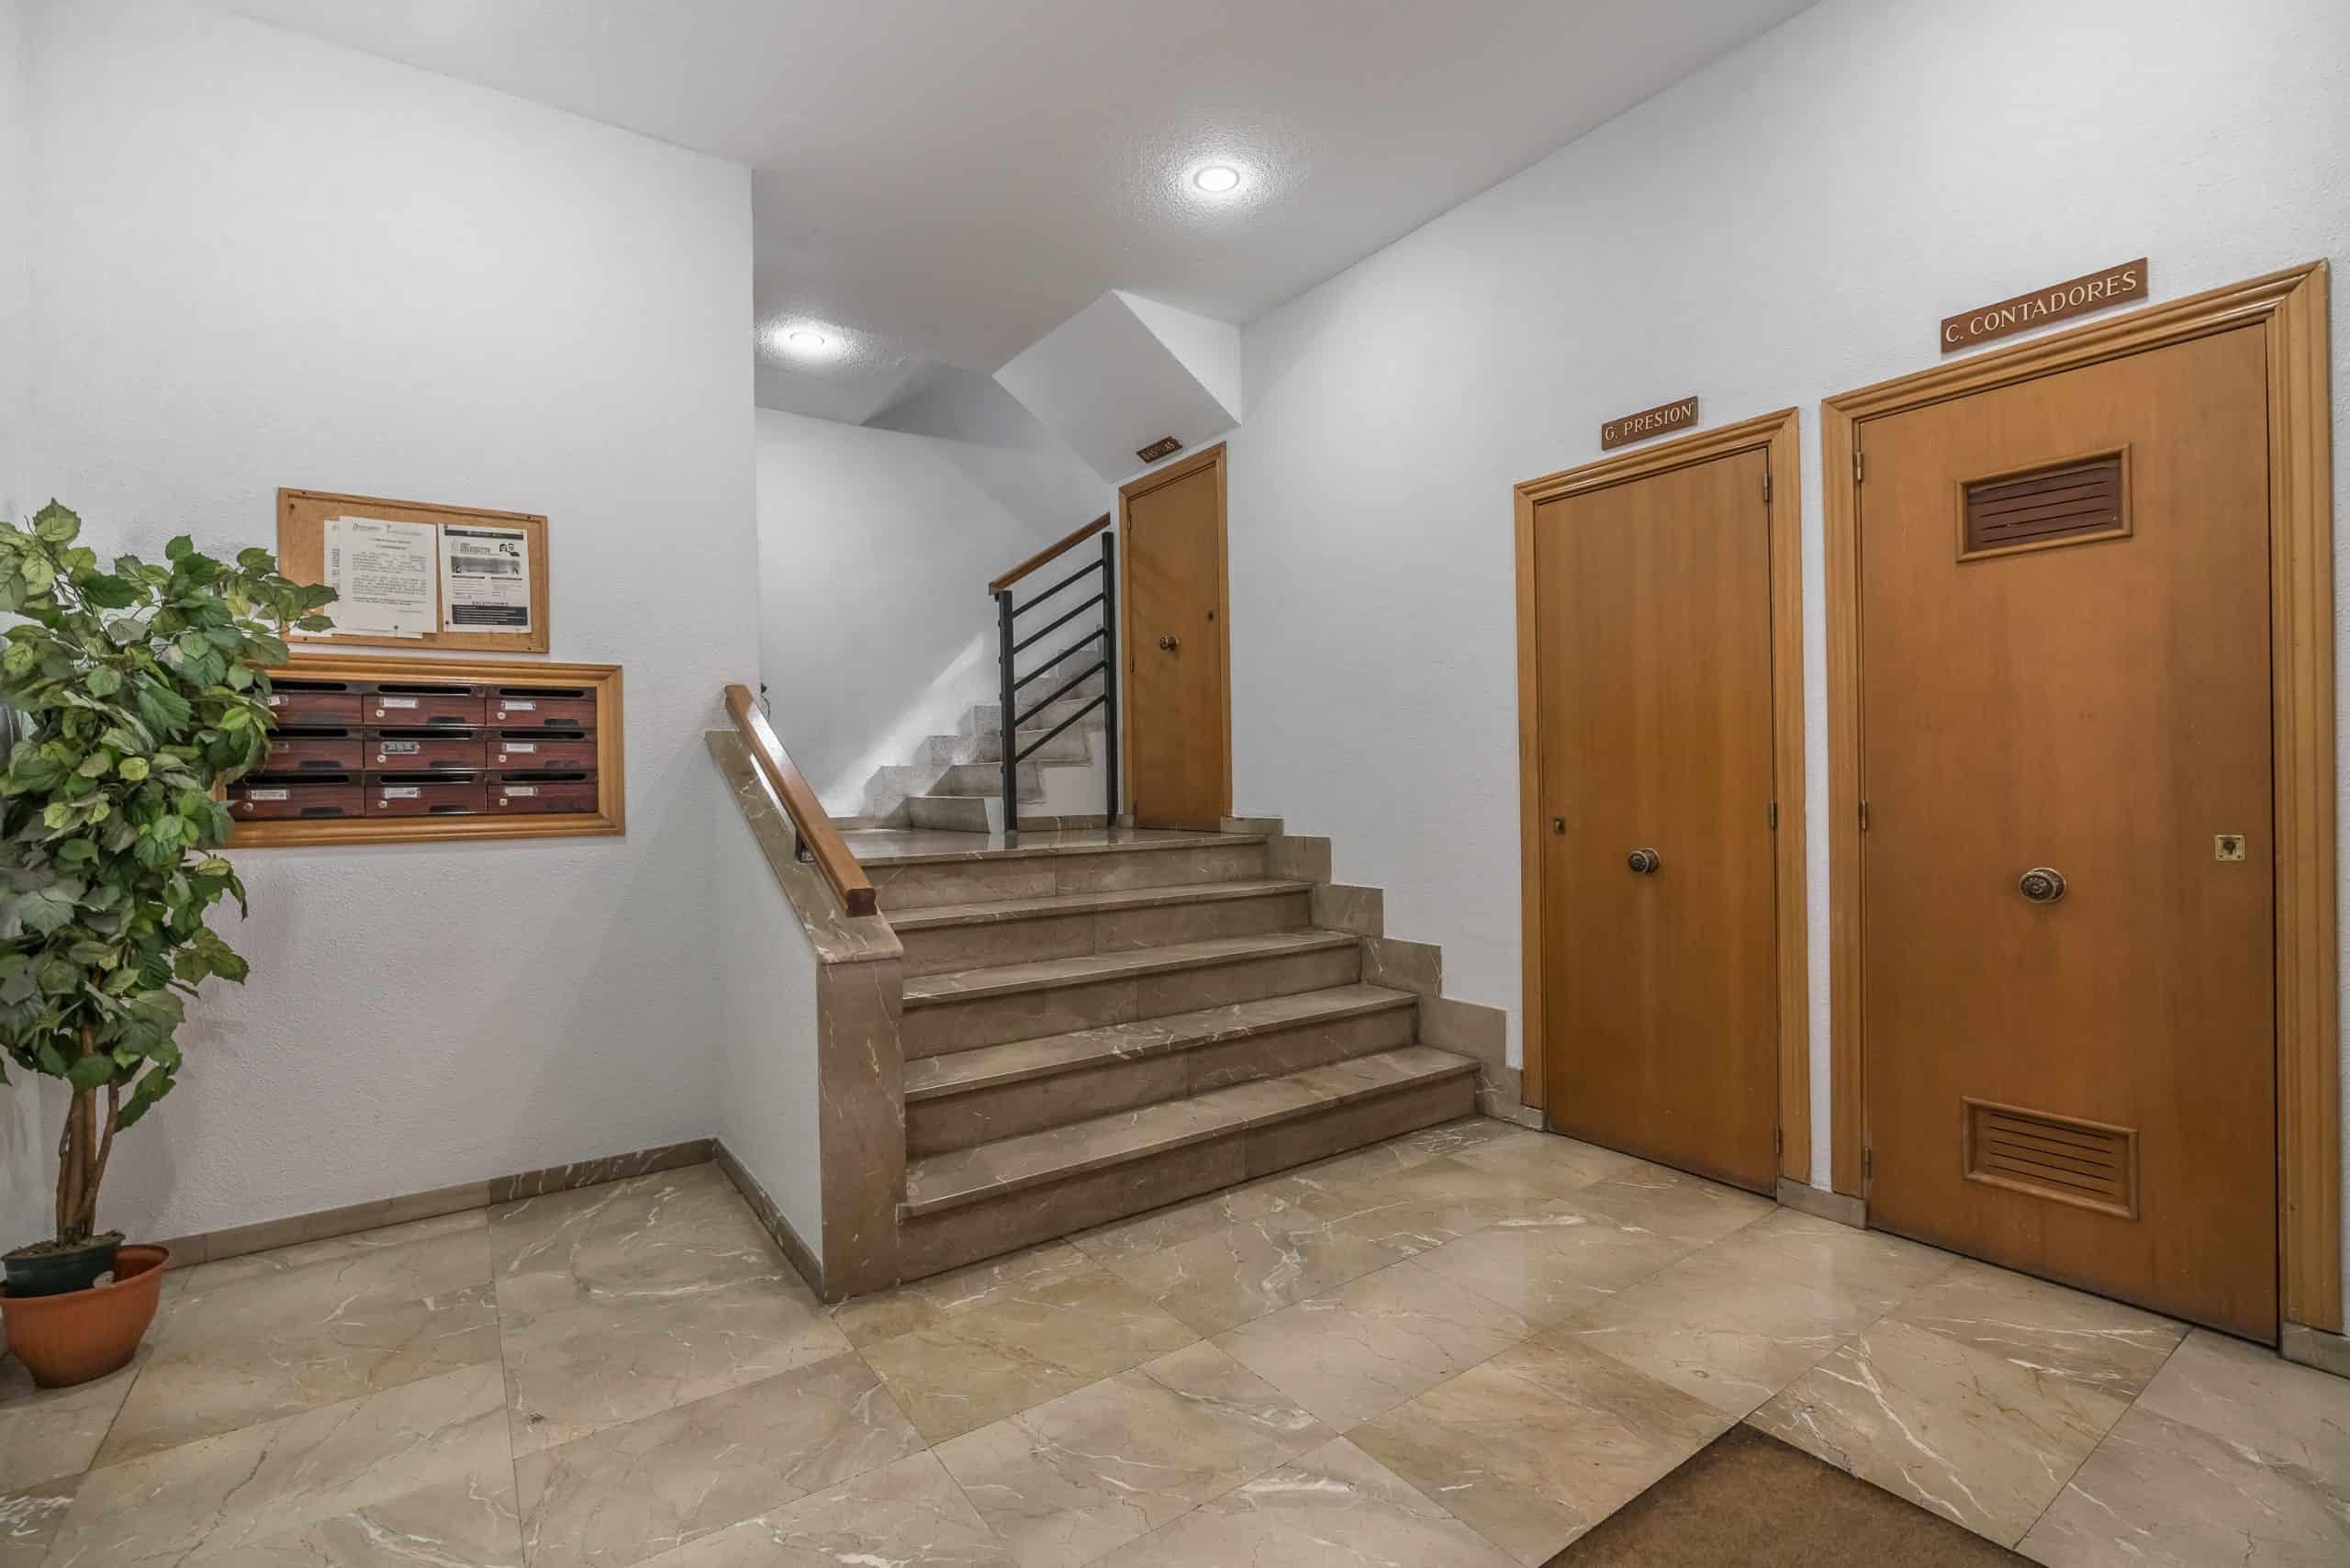 Agencia Inmobiliaria de Madrid-FUTUROCASA- ZONAS COMUNES (3)